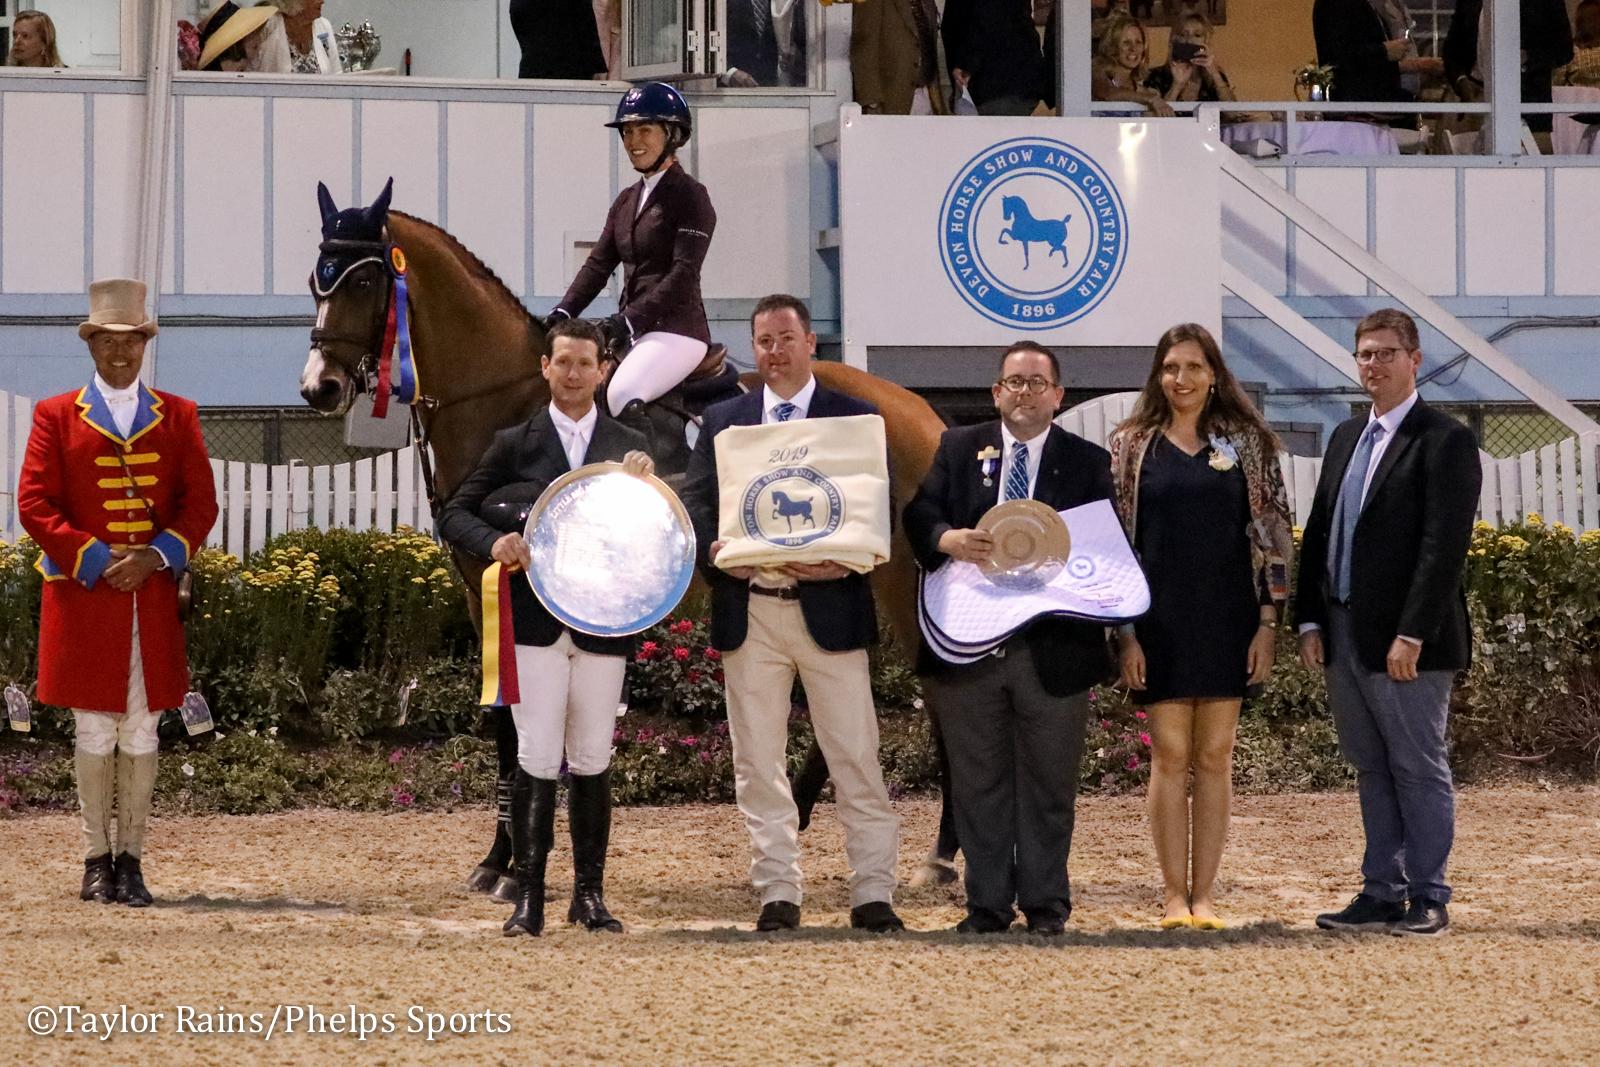 2019 Devon Horse Show Open Jumper champions: Amanda Derbyshire (aboard Roulette BH) and McLain Ward